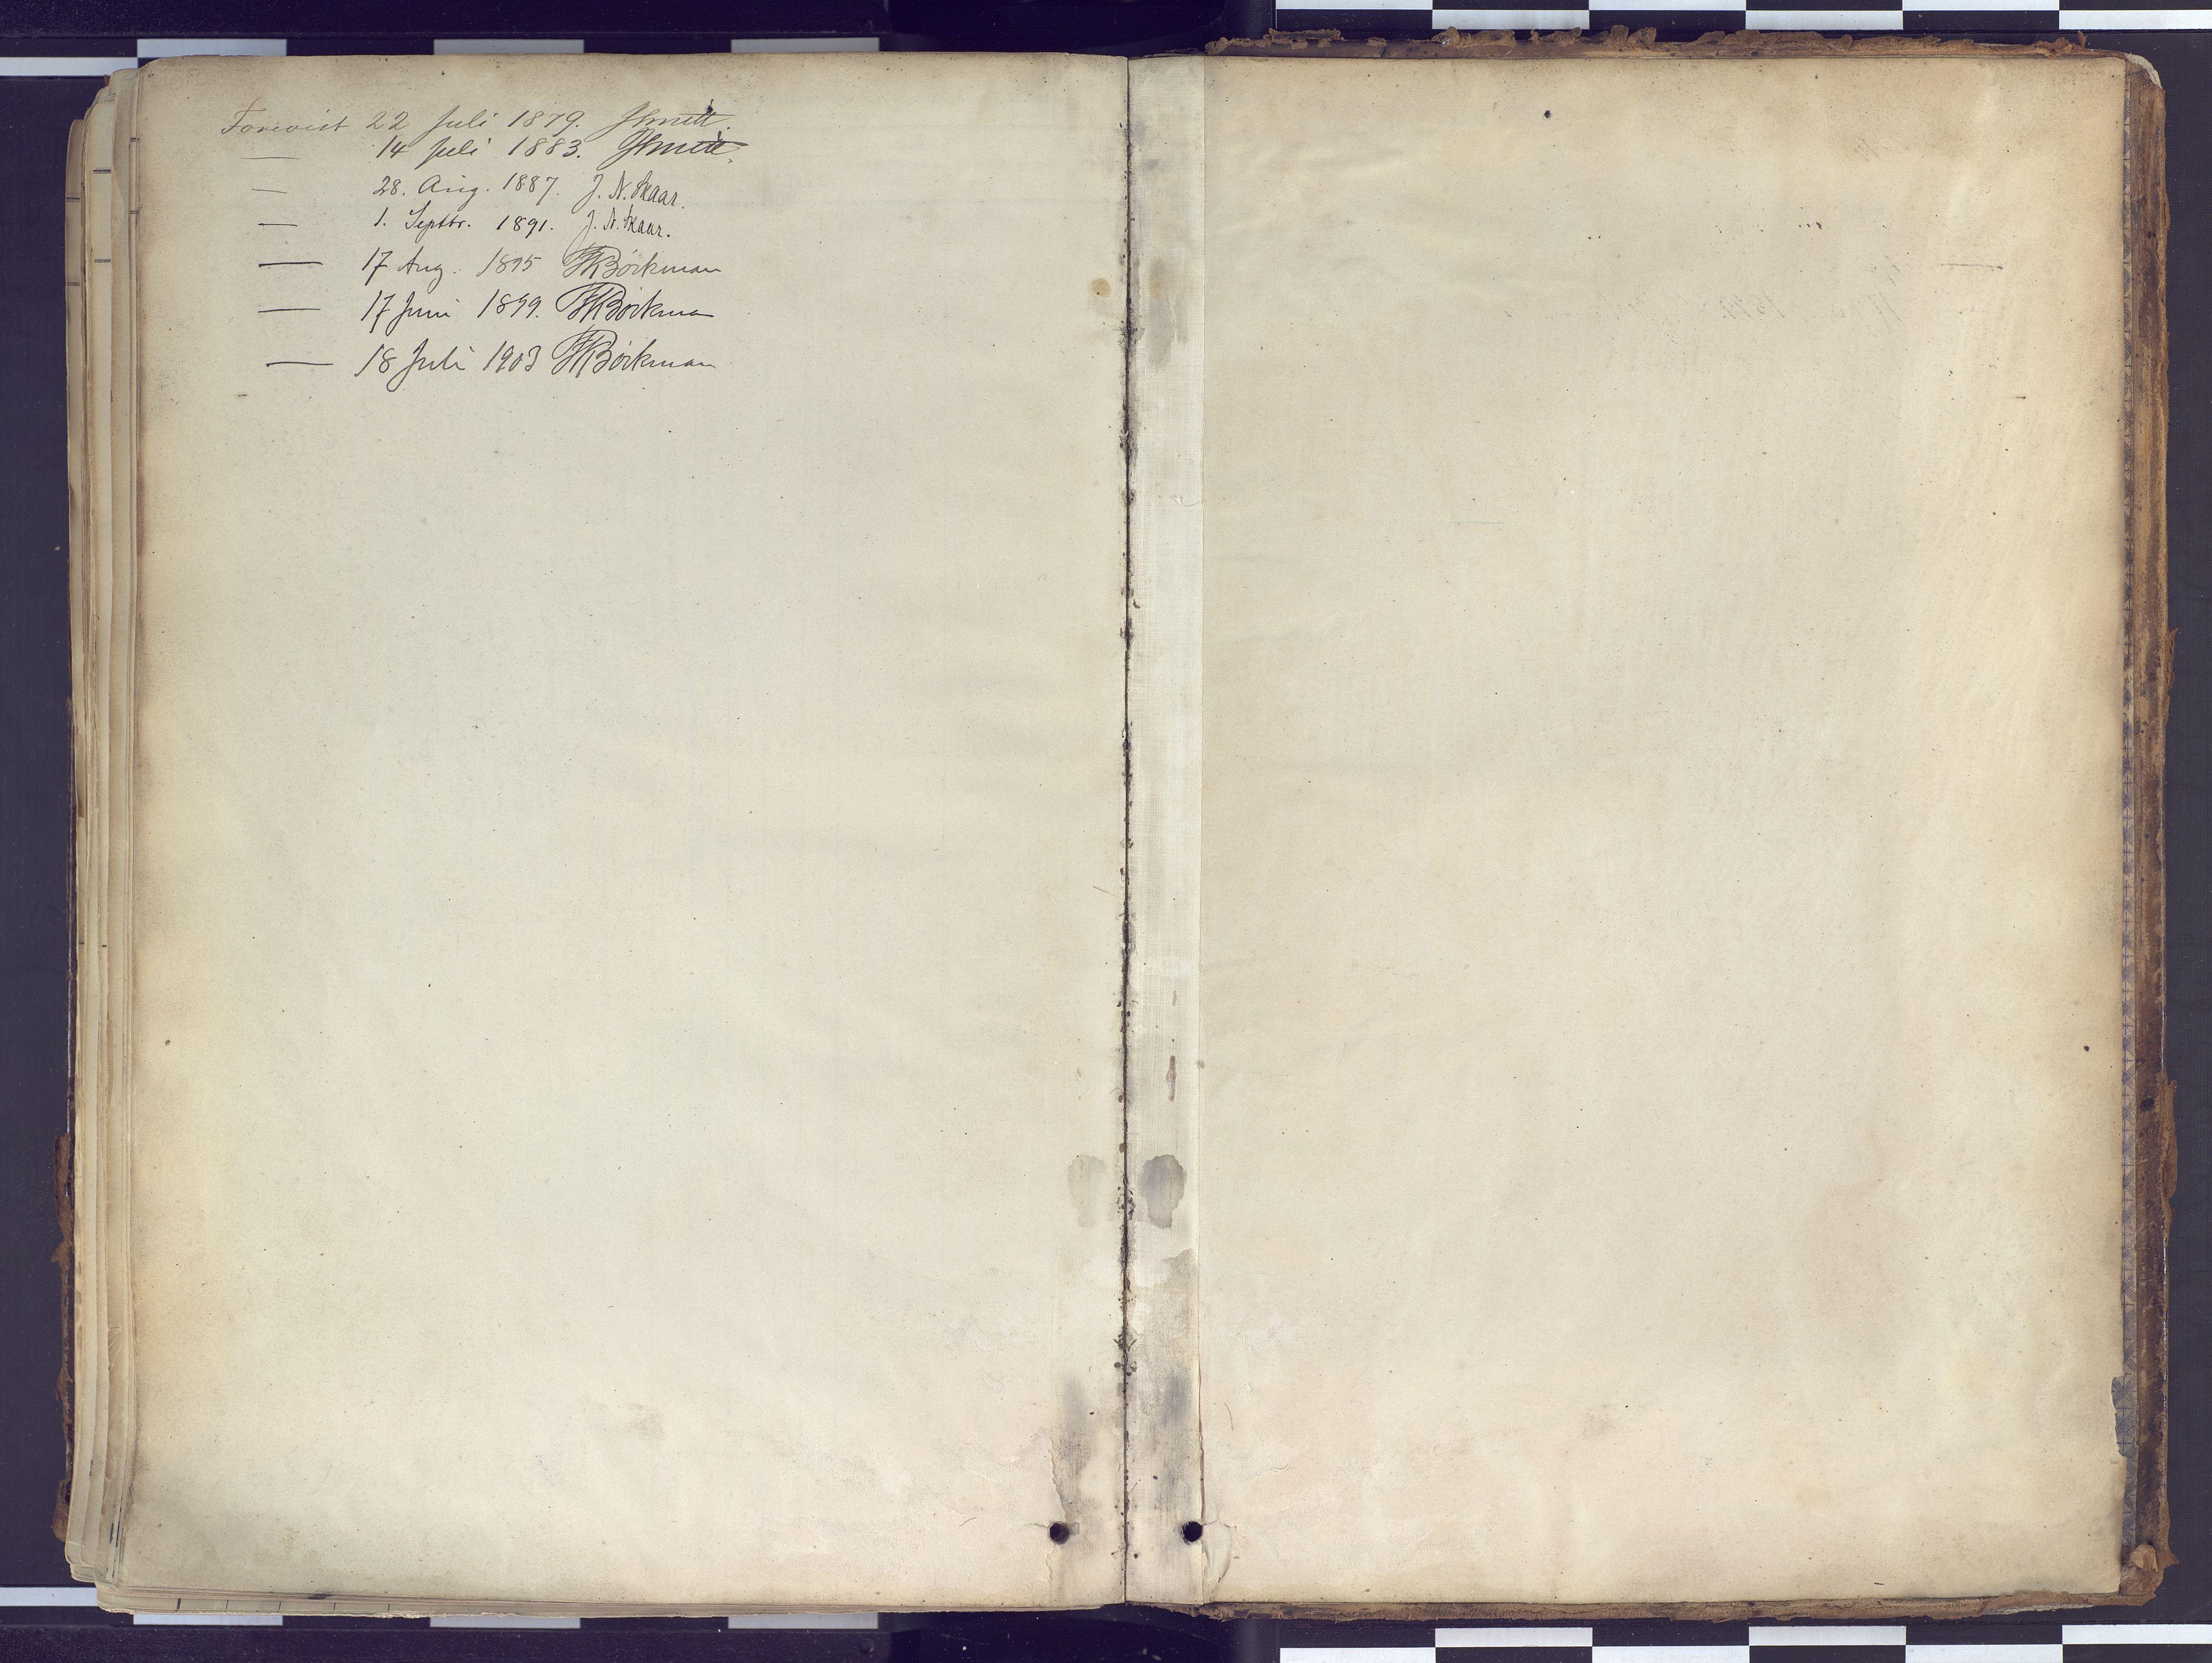 SATØ, Tranøy sokneprestkontor, I/Ia/Iaa/L0010kirke: Ministerialbok nr. 10, 1878-1904, s. 336